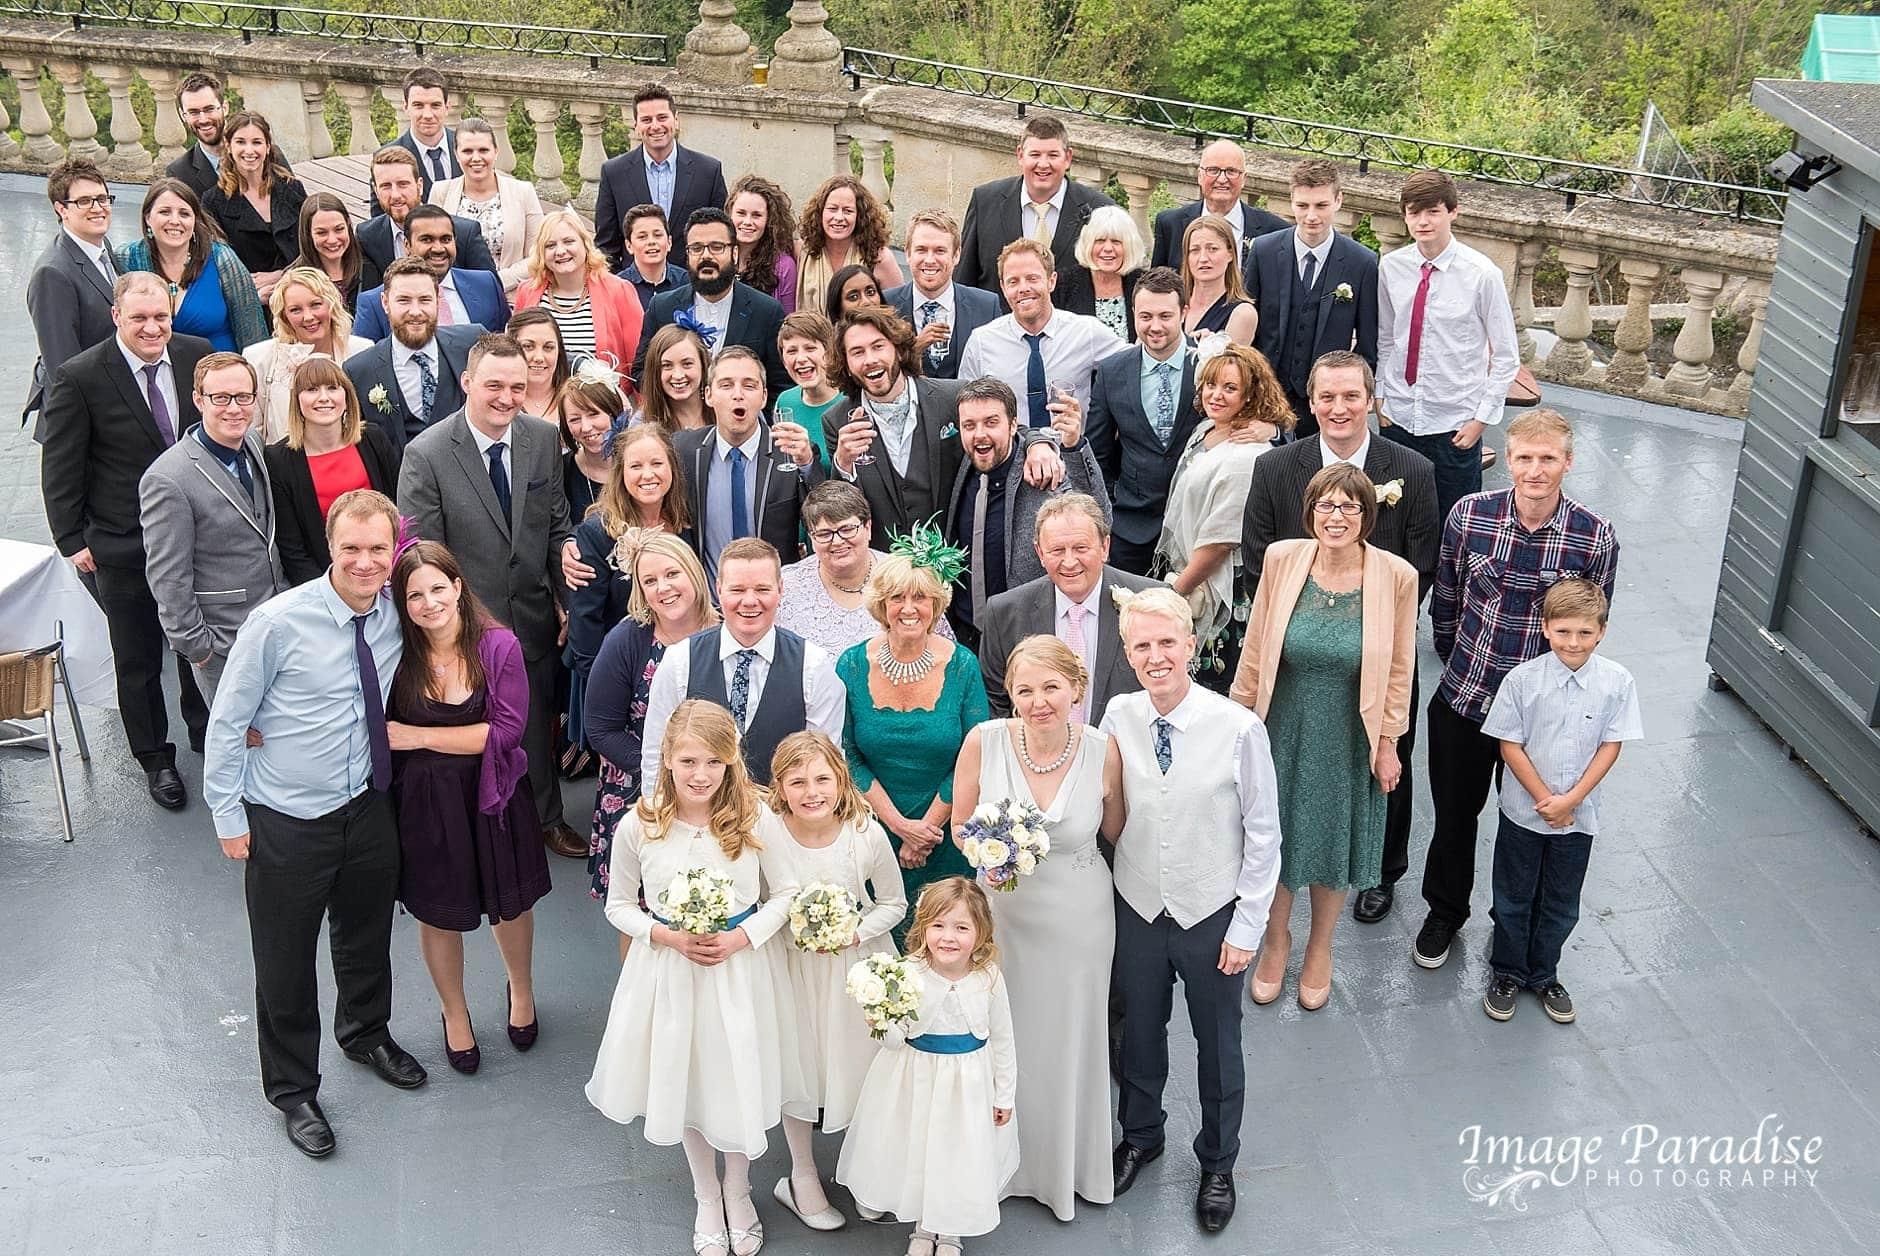 Group wedding photo at Avon Gorge Hotel